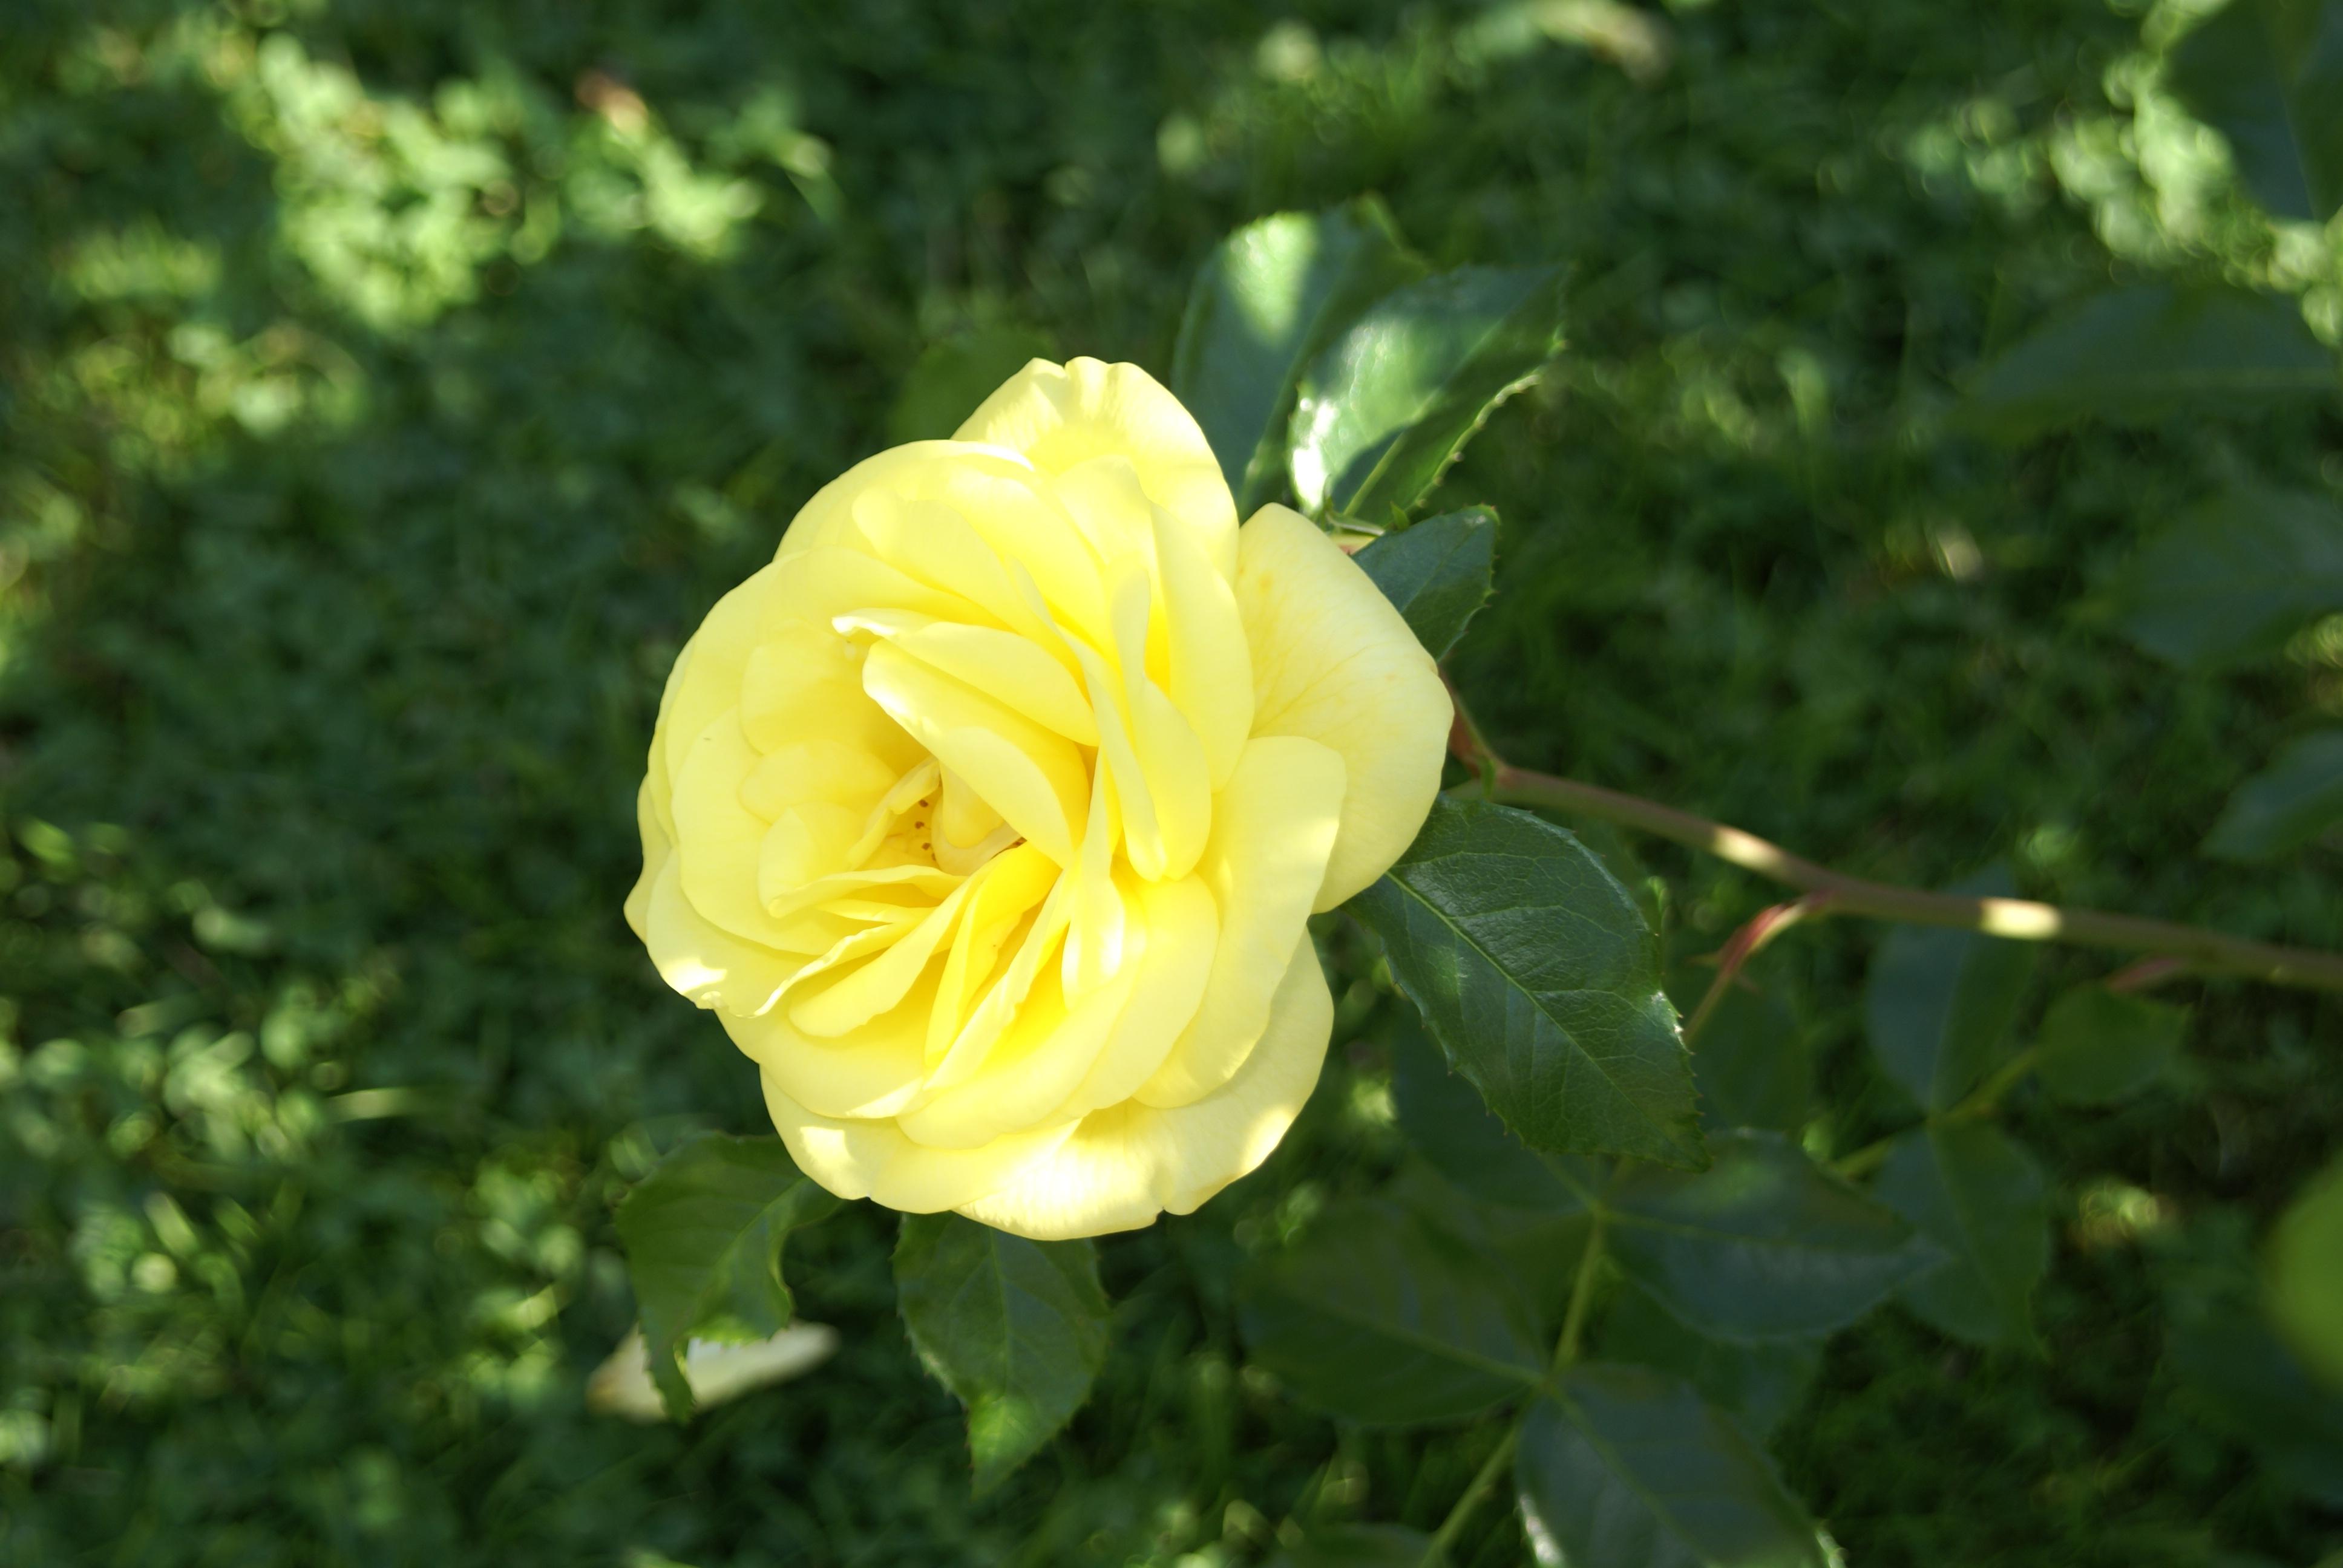 images gratuites fleur jaune rose famille flore floribunda plante fleurs ordre des. Black Bedroom Furniture Sets. Home Design Ideas